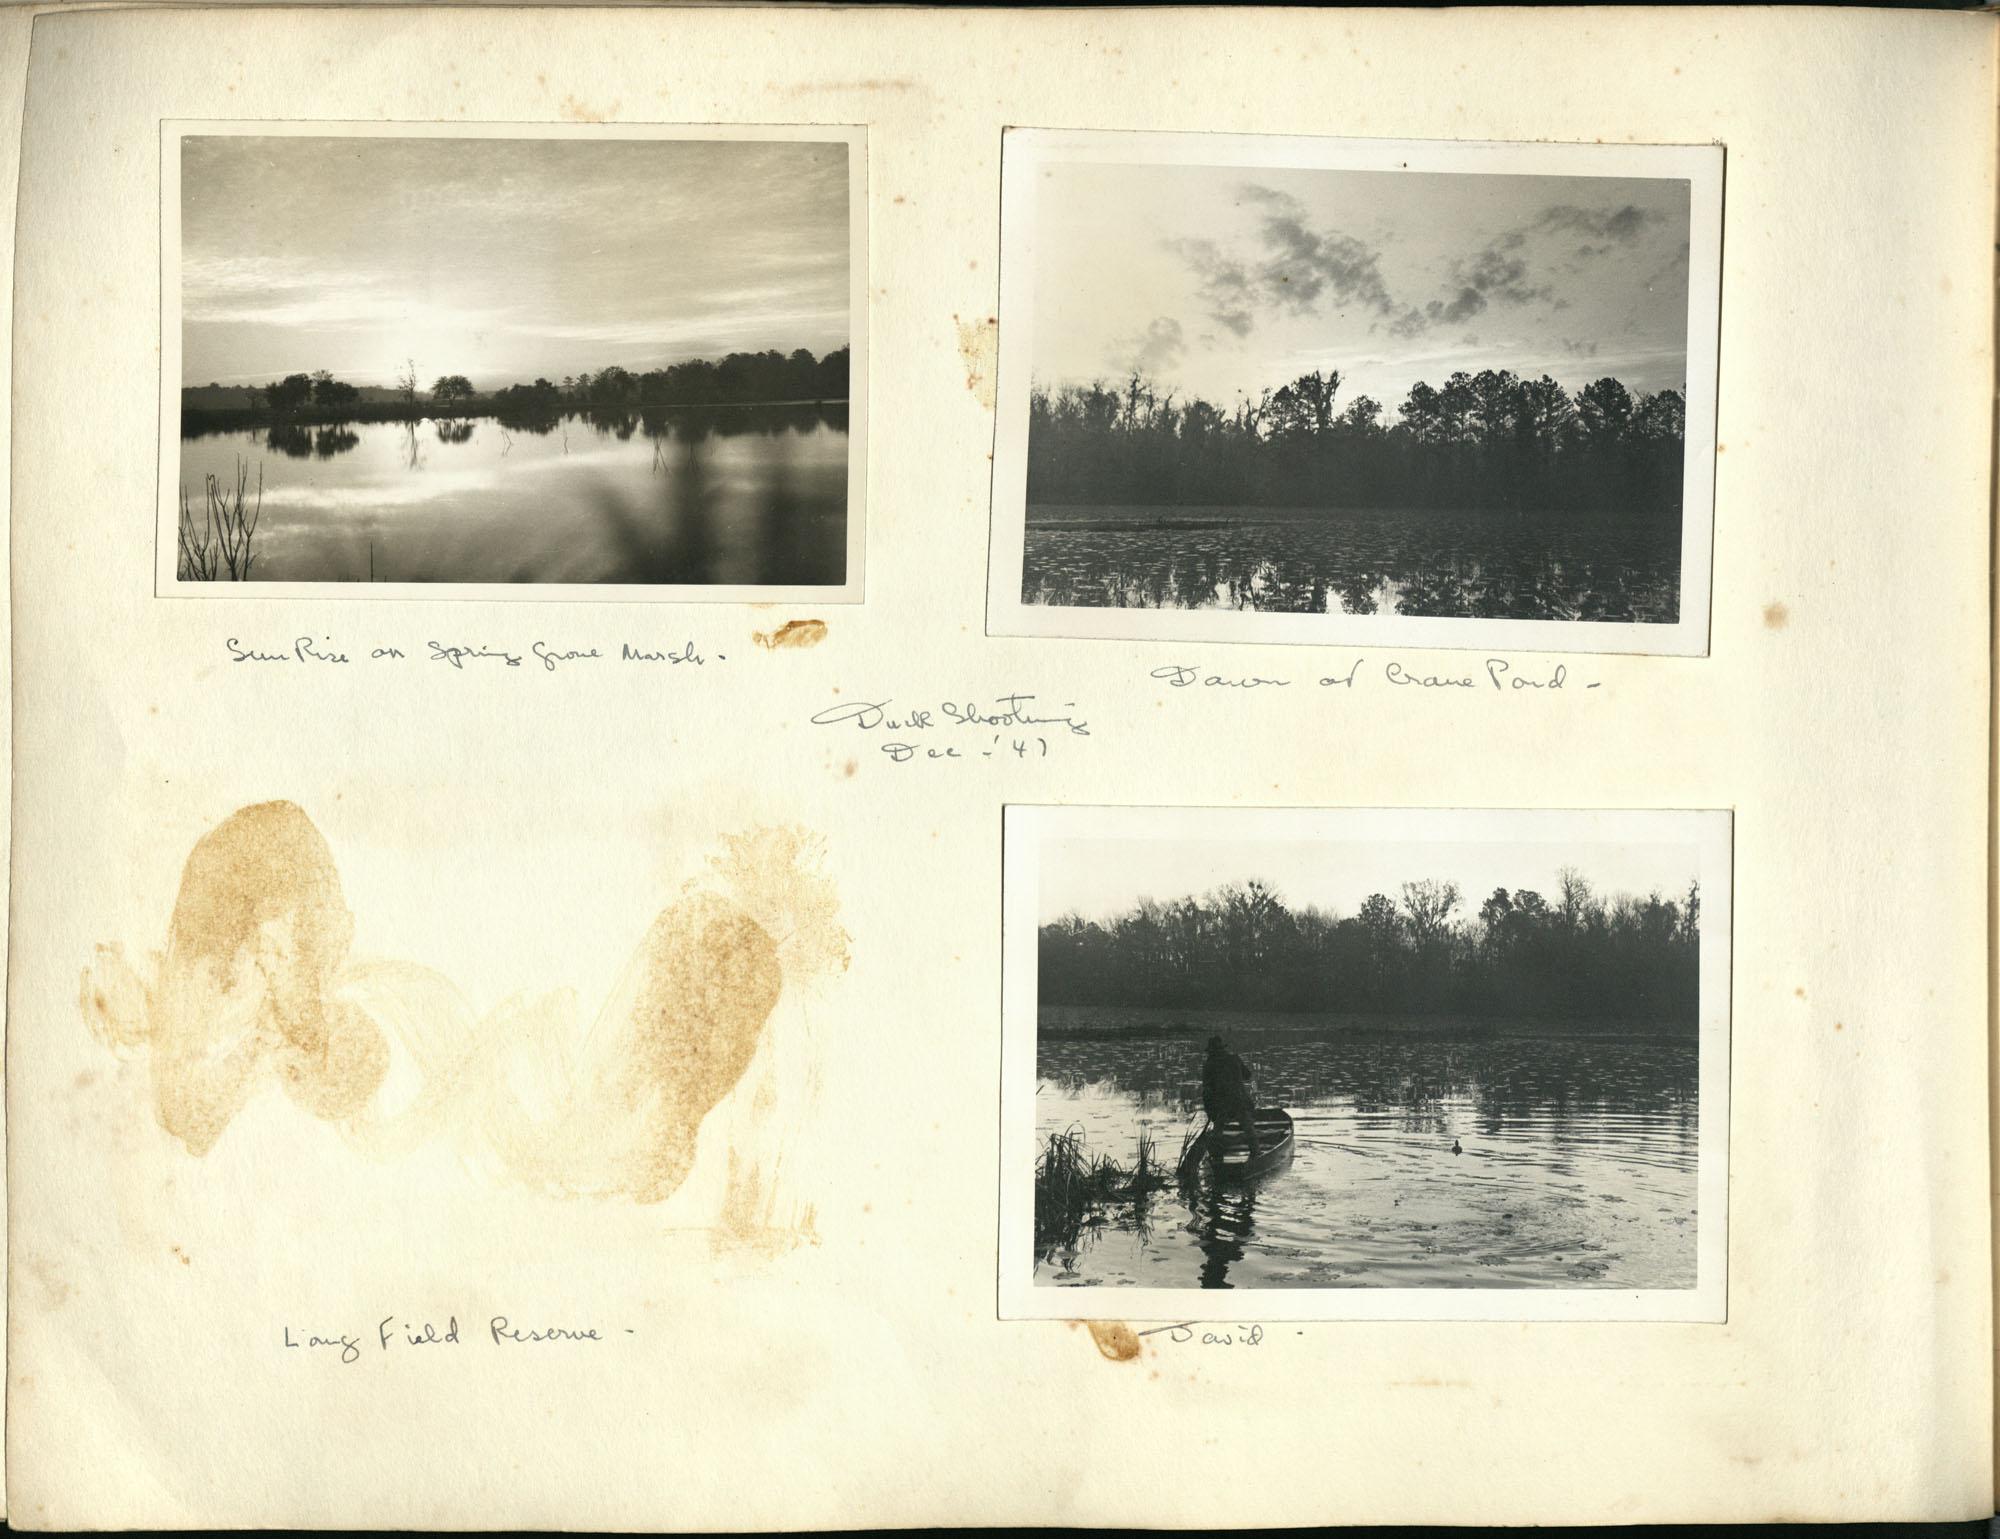 Medway Plantation Photograph Album, 1949, page 114